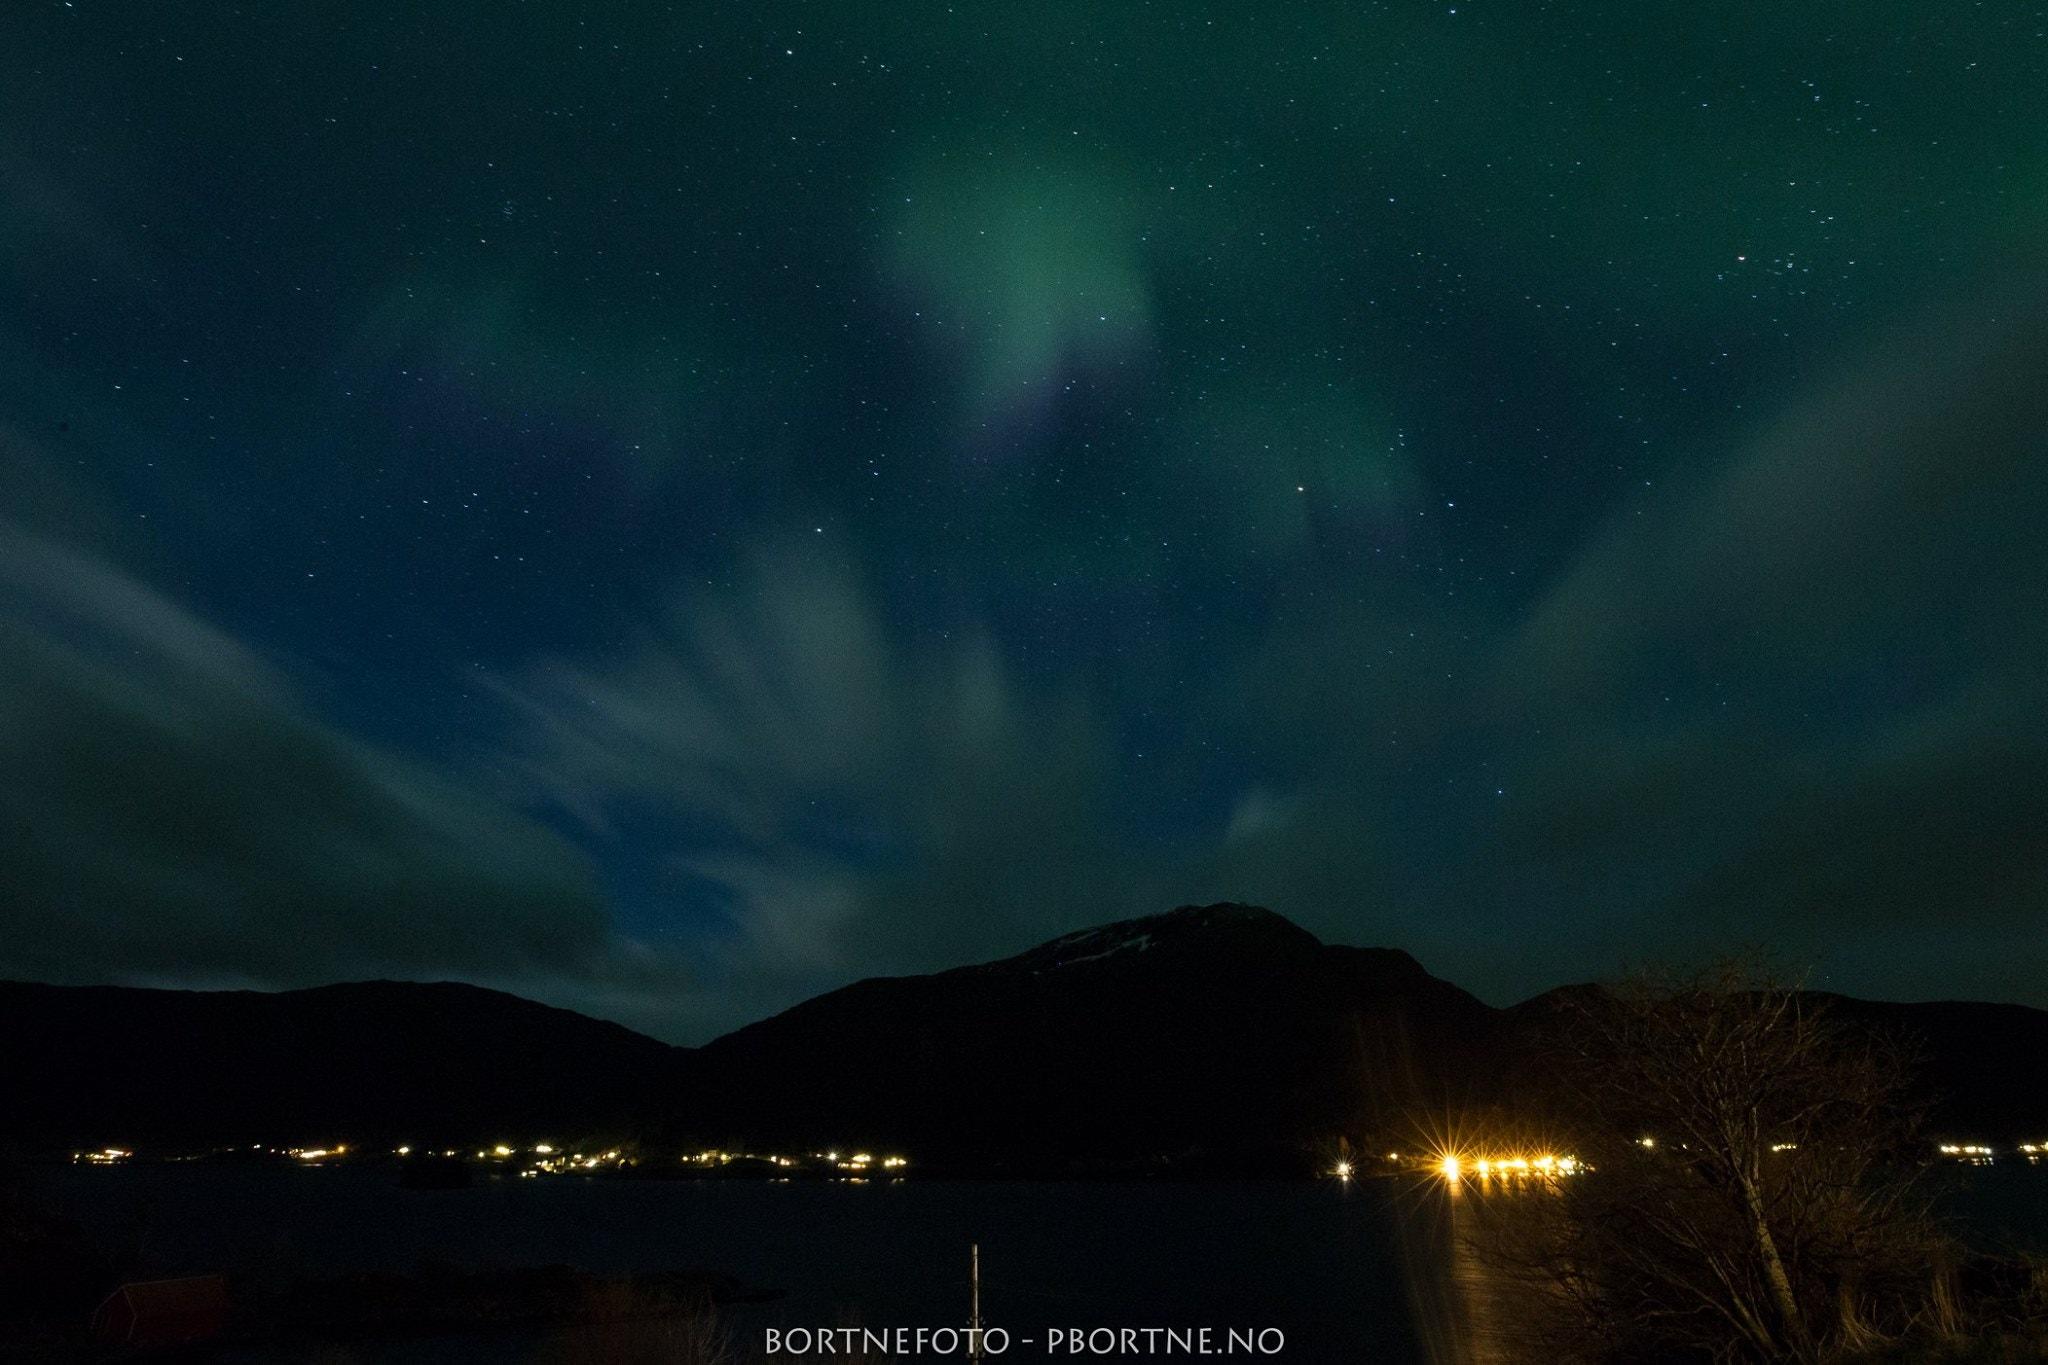 nyegolfsko-northern-lights-bortne-norway (1).jpg